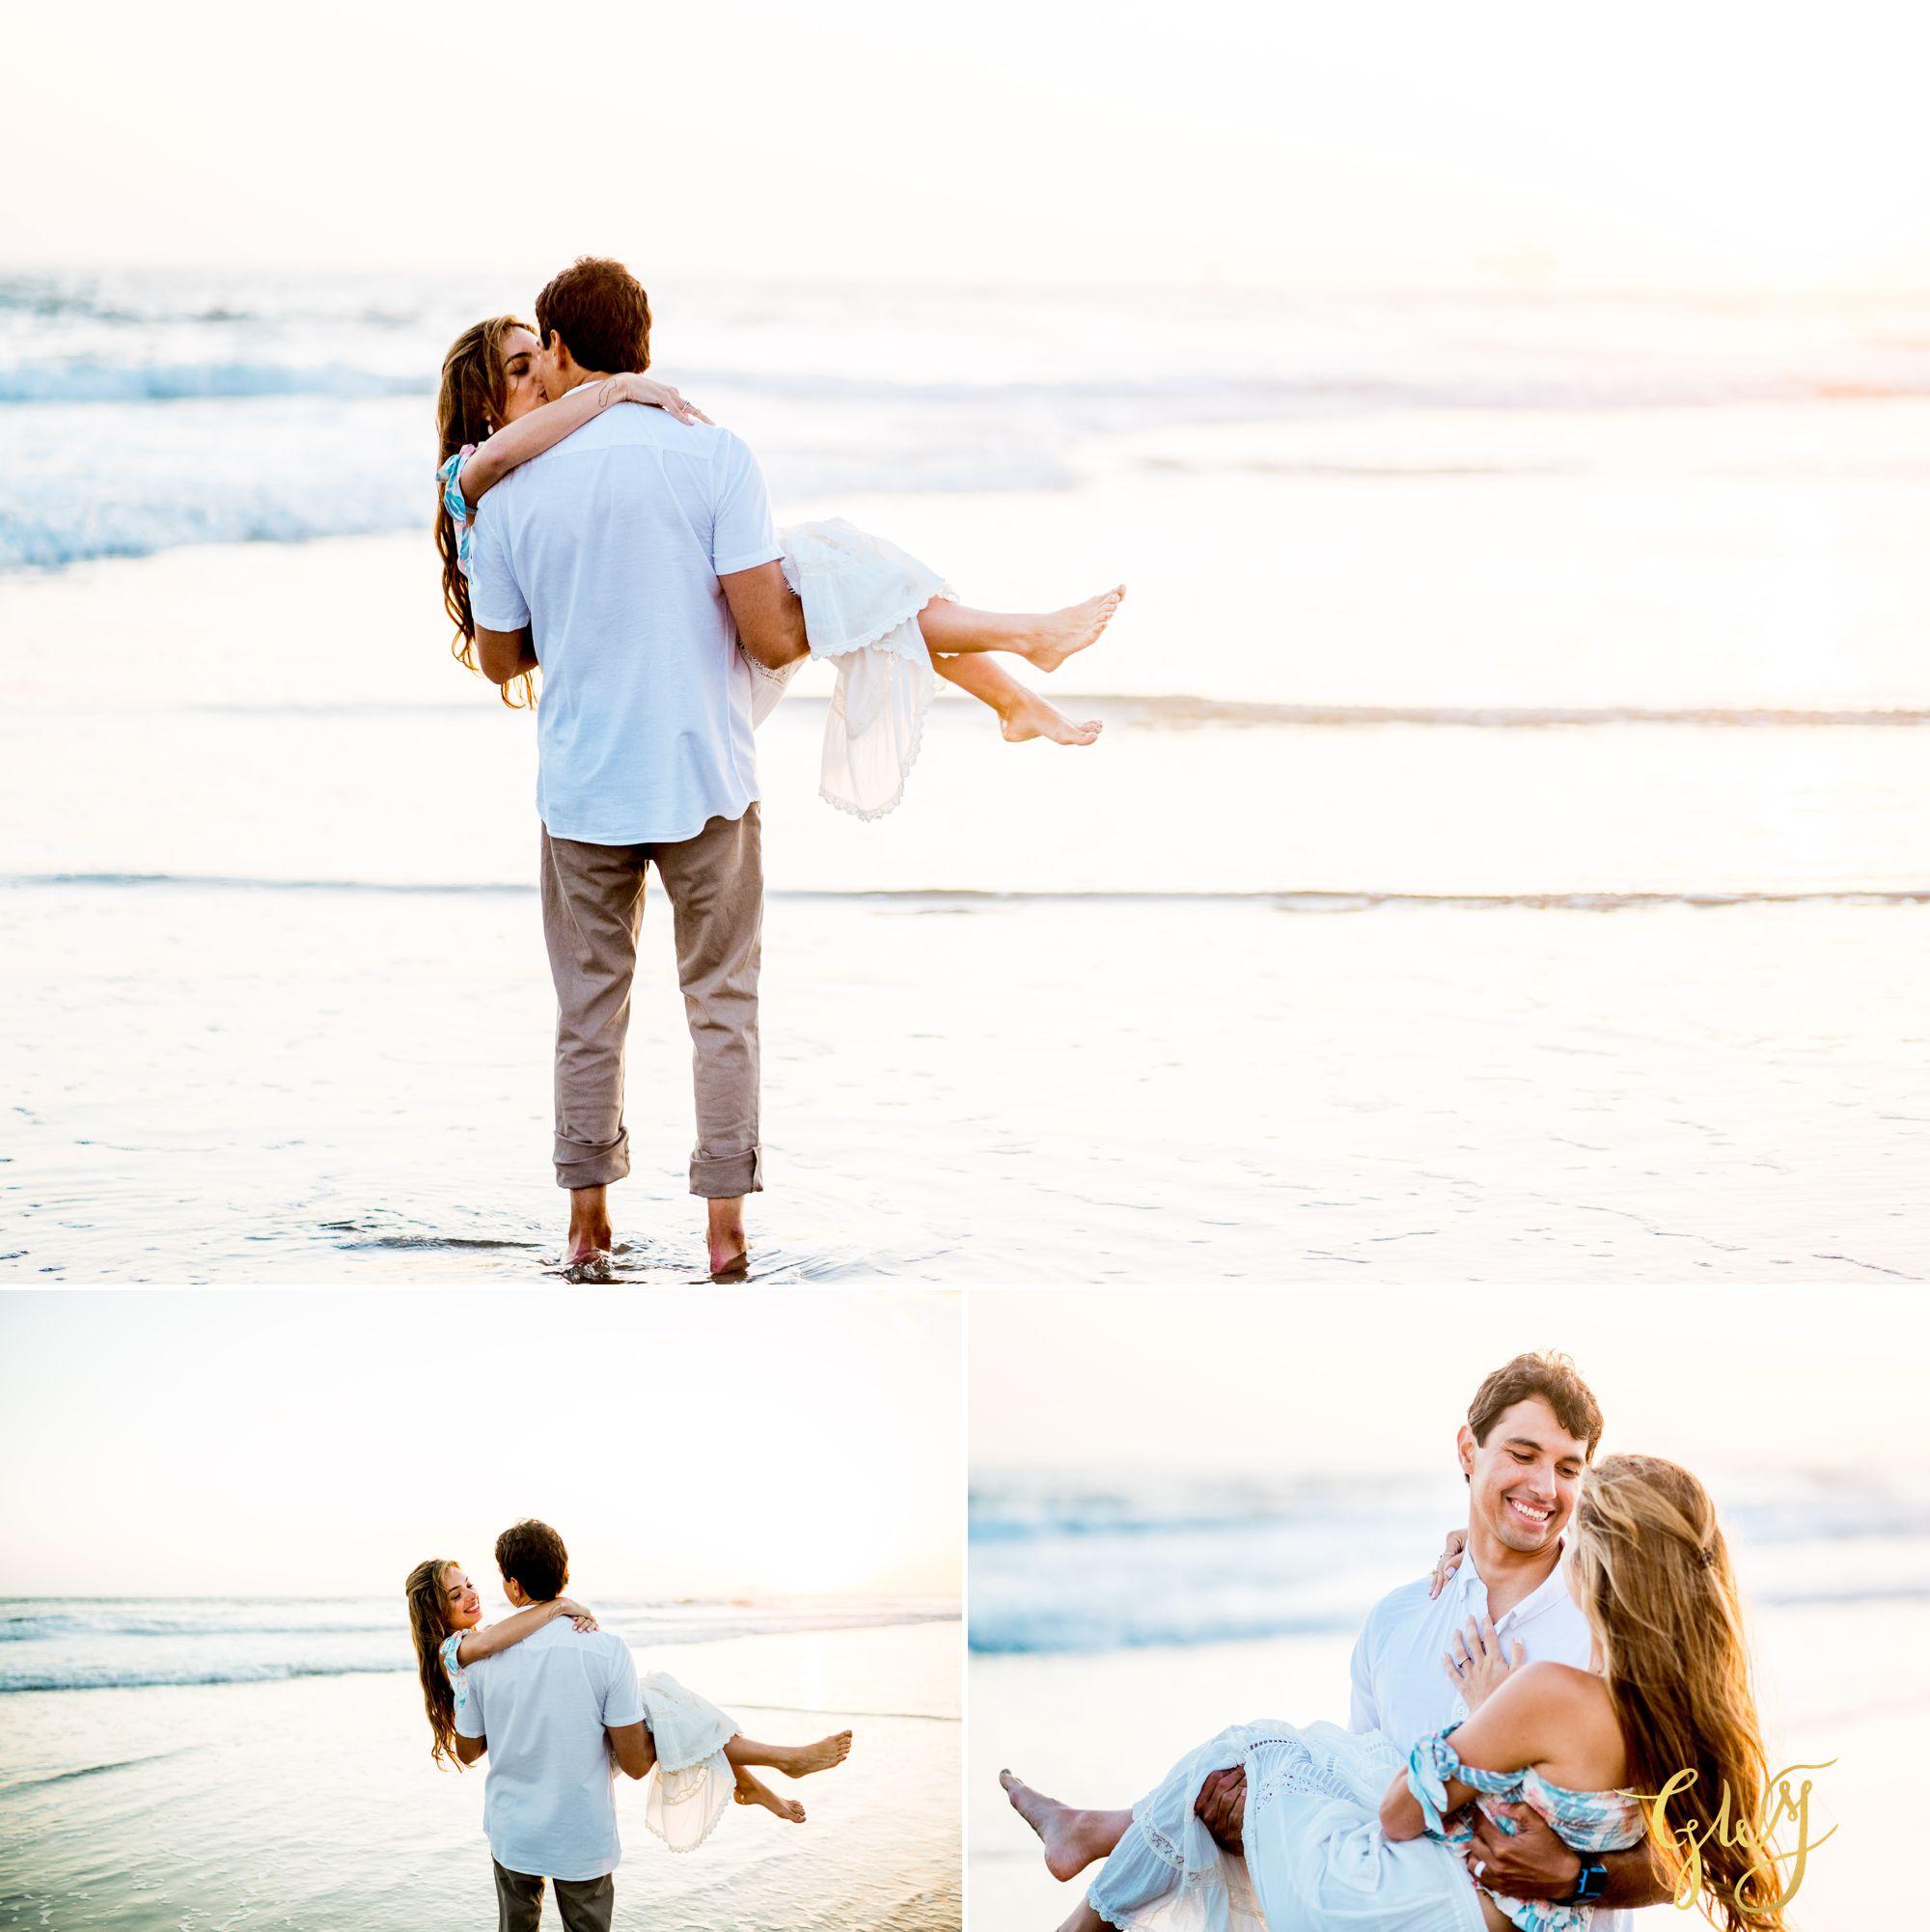 Felipe + Isabella Huntington Beach Summer Sunset Engagement Session by Glass Woods Media 29.jpg